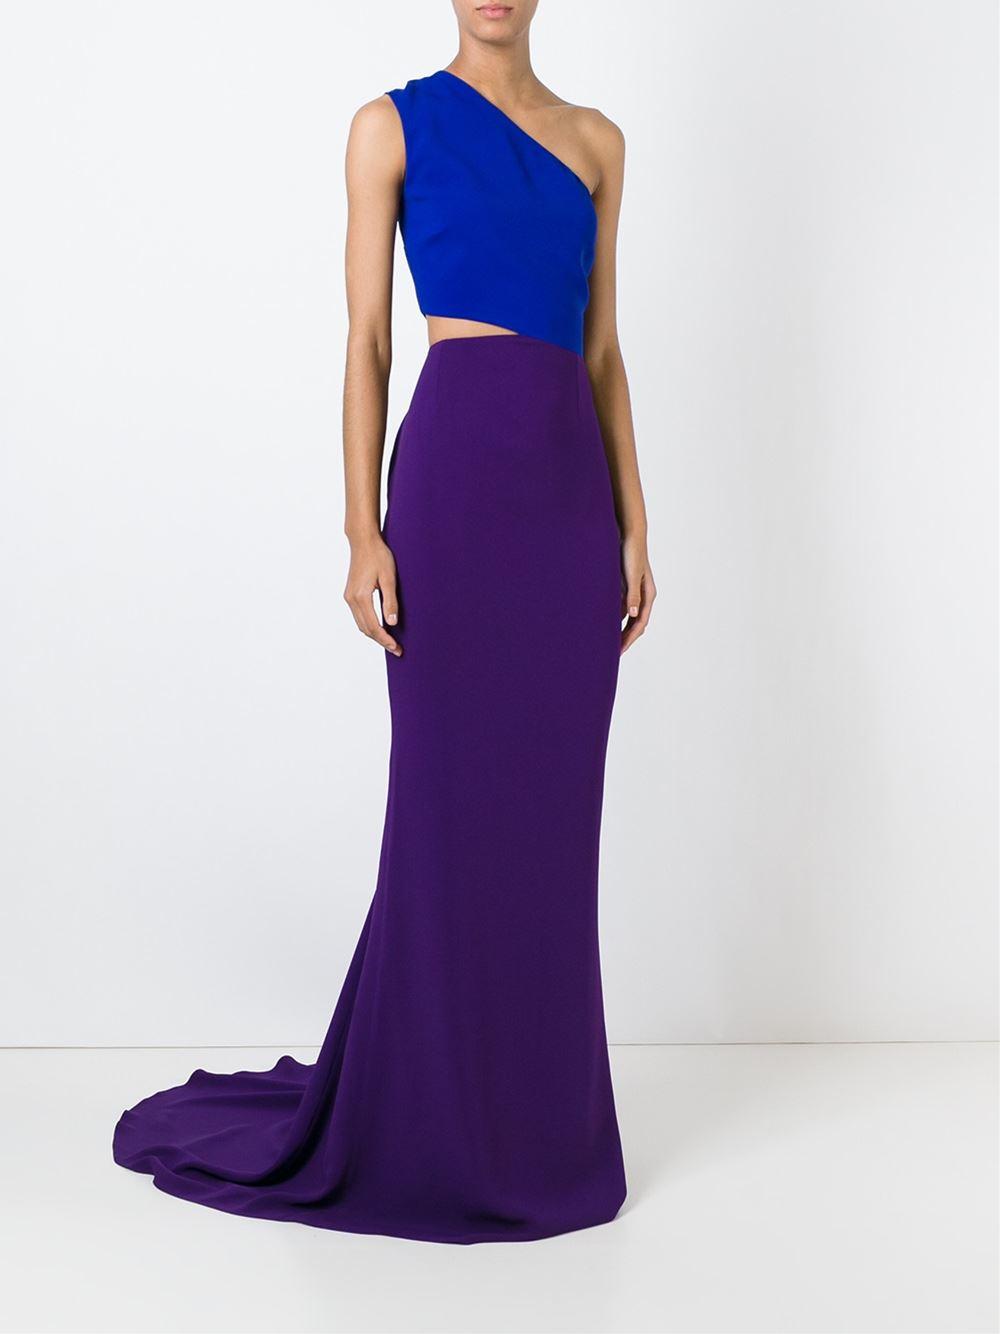 Lyst - Stella Mccartney One Shoulder Evening Gown in Blue